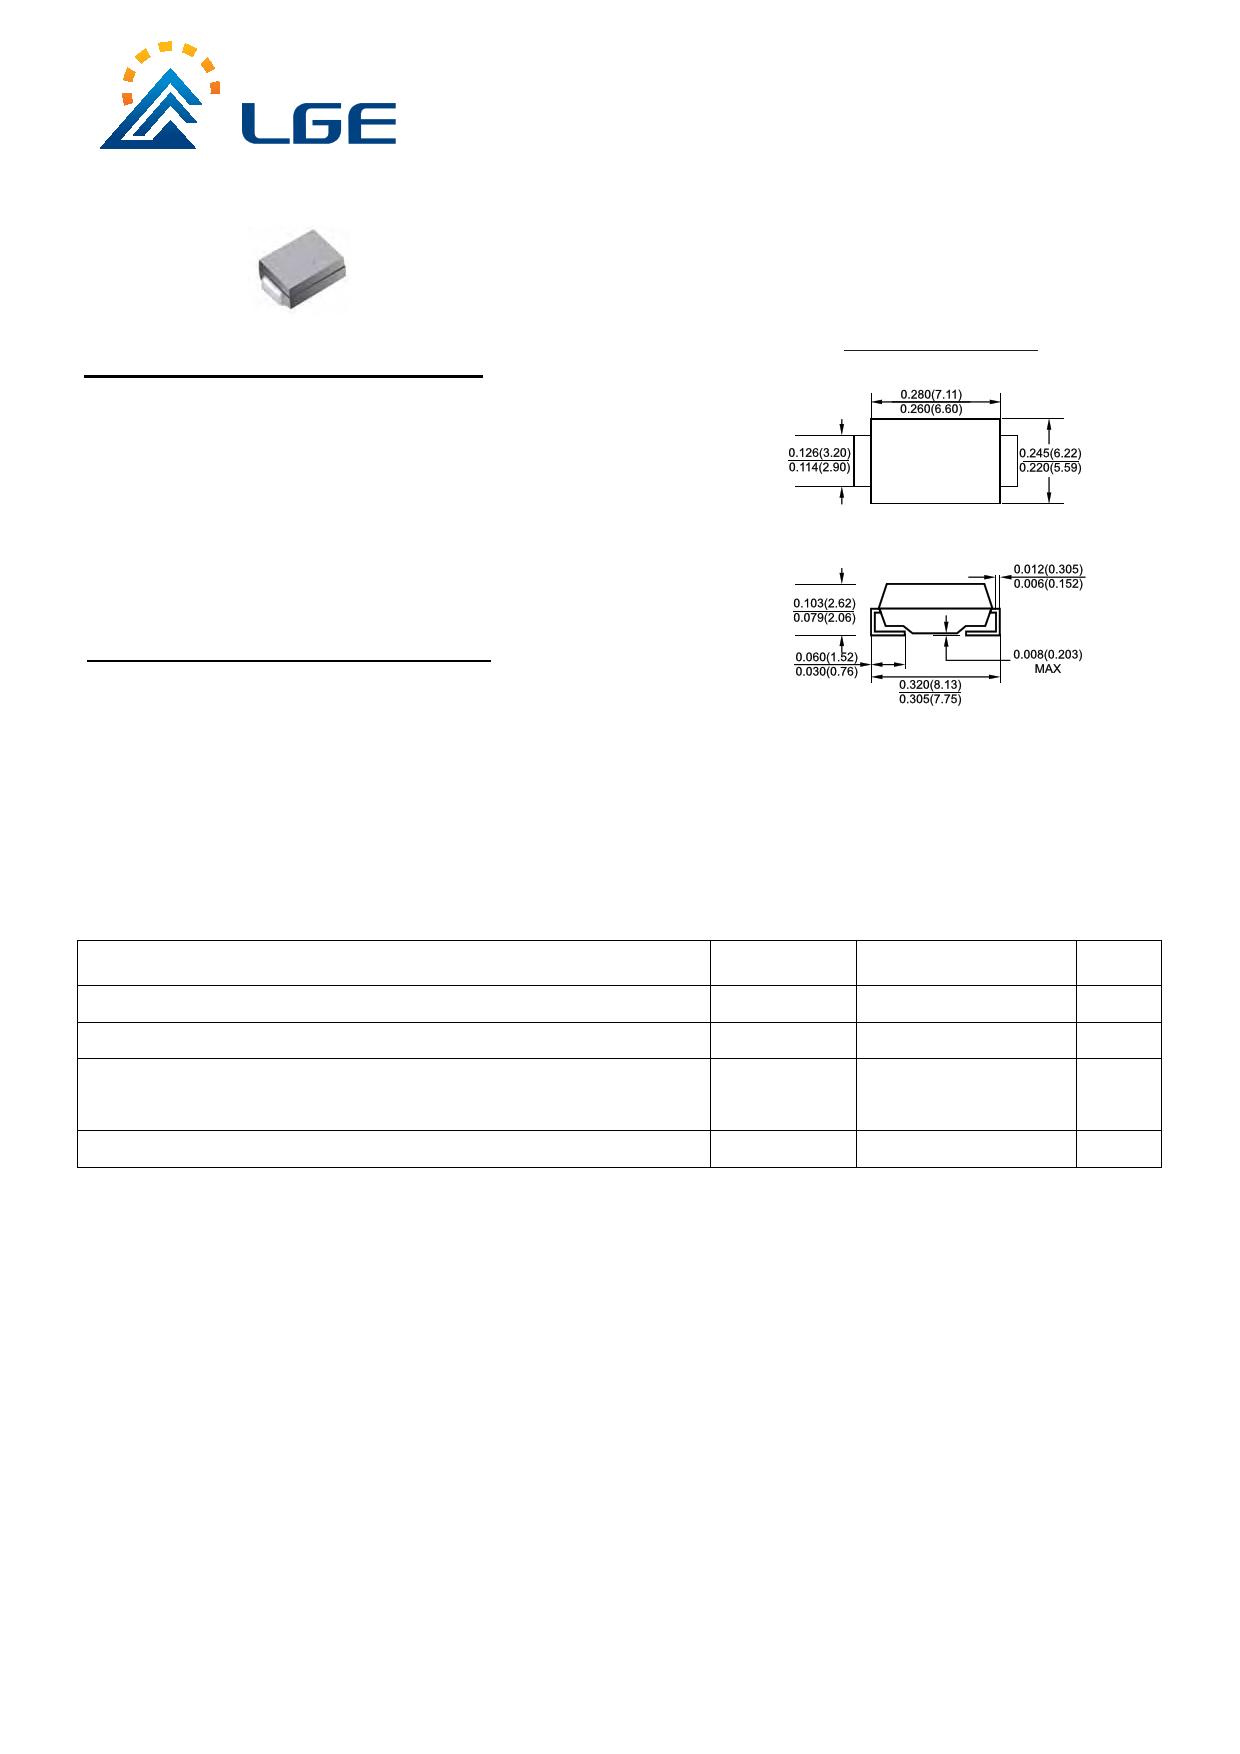 3.0SMCJ190CA Datasheet, 3.0SMCJ190CA PDF,ピン配置, 機能